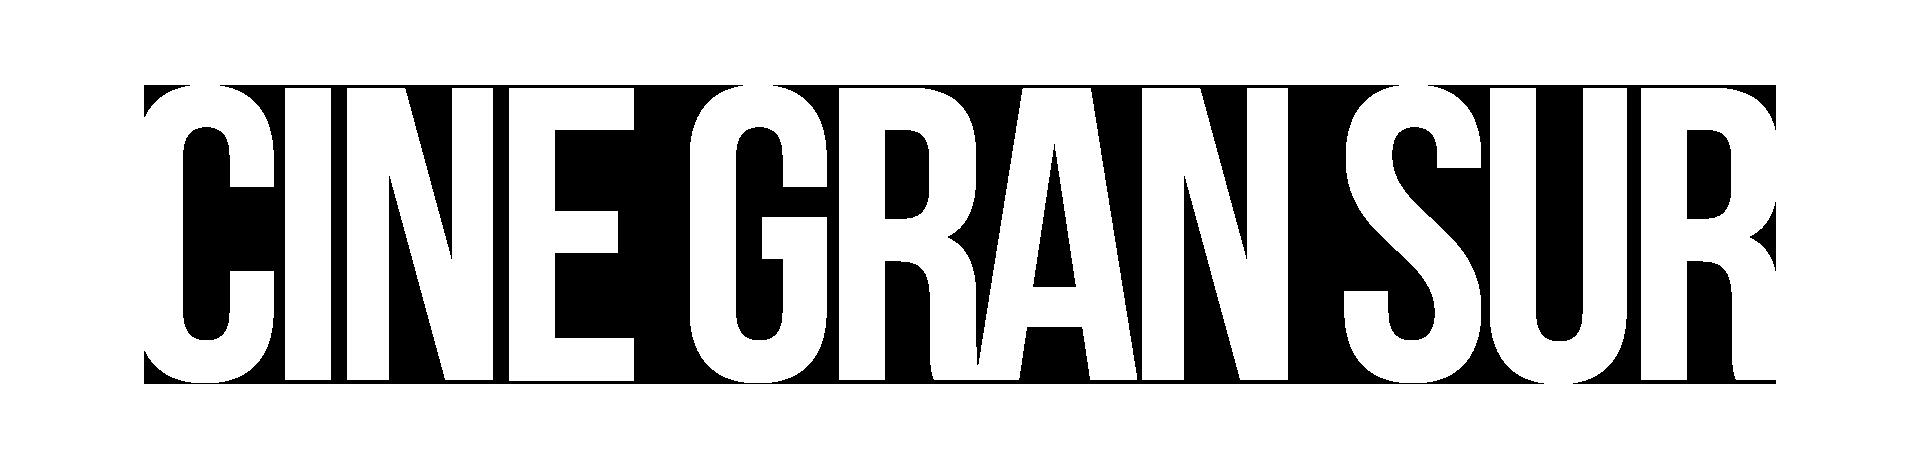 cine gran sur logo provisional